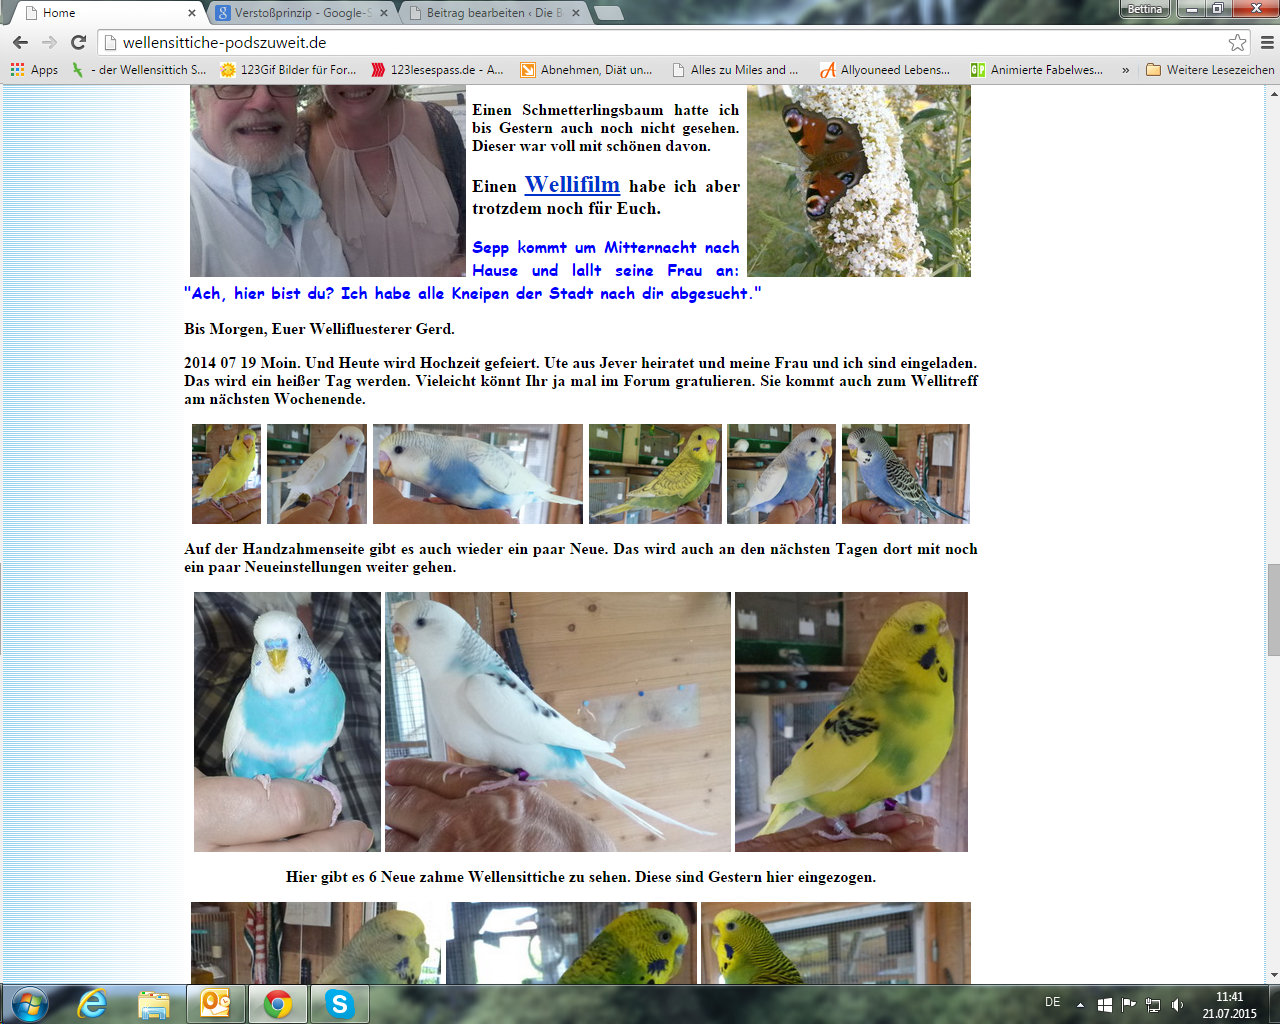 Screenshot 2015-07-21 11.41.58